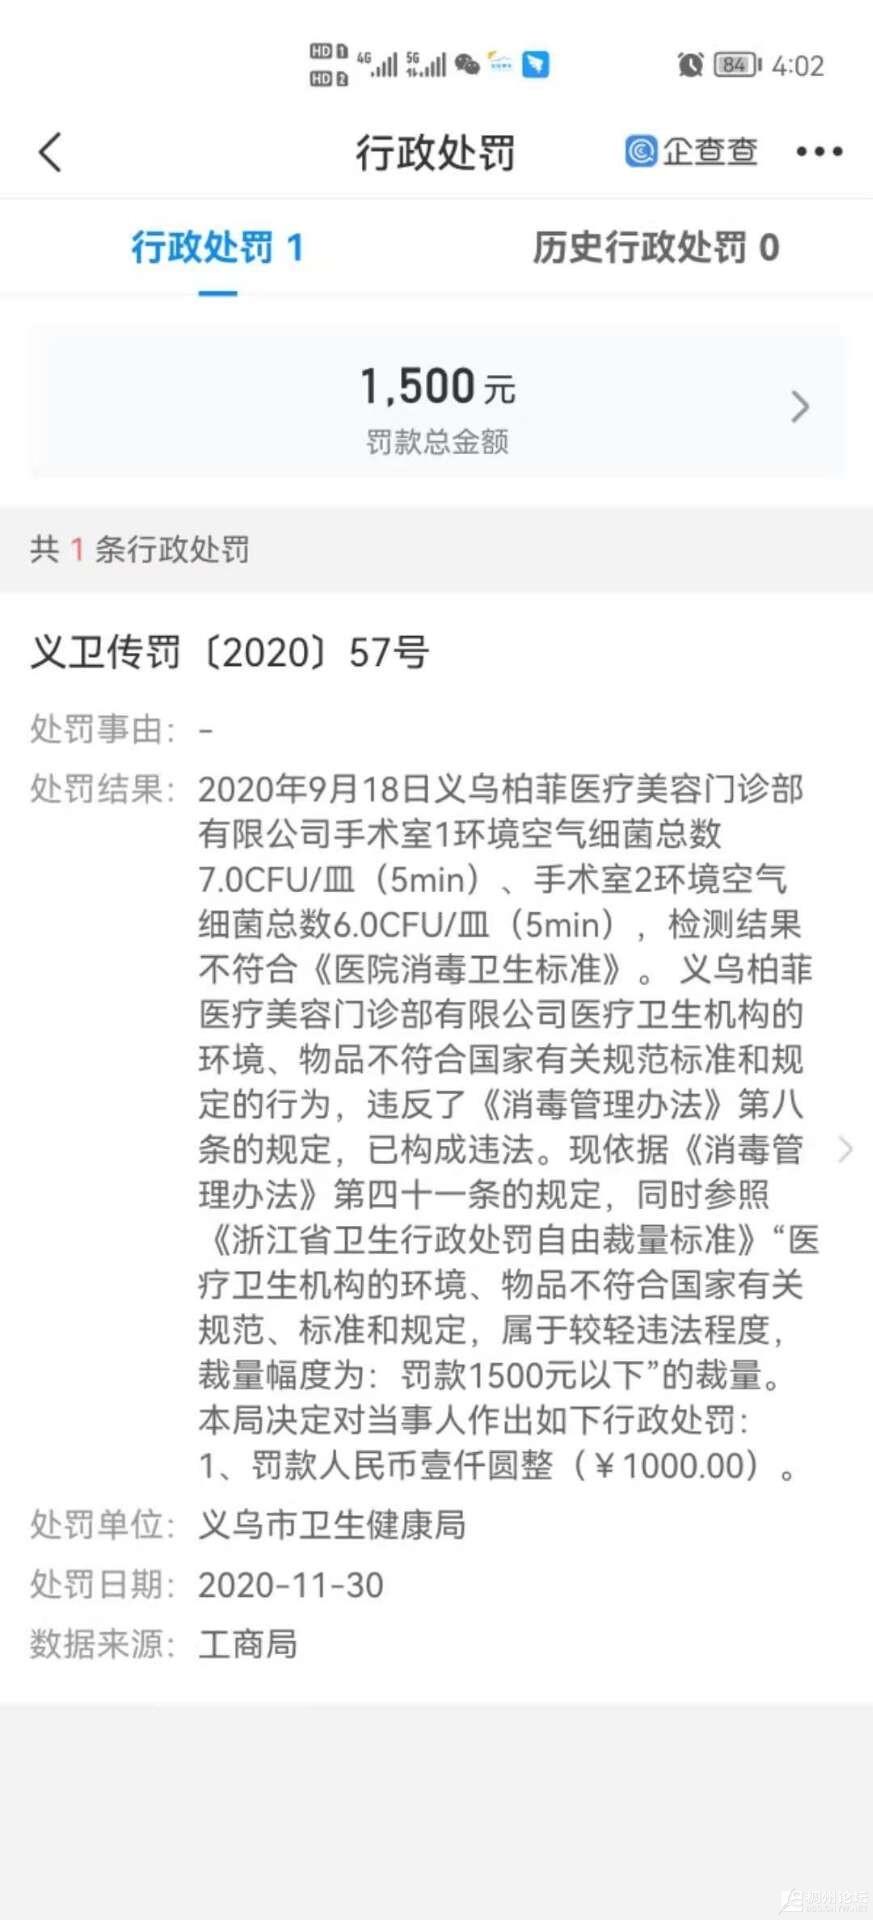 front2_0_Fuowq4g002bz1qS_4NQXxLMUZ8Ei.1627045529.jpg